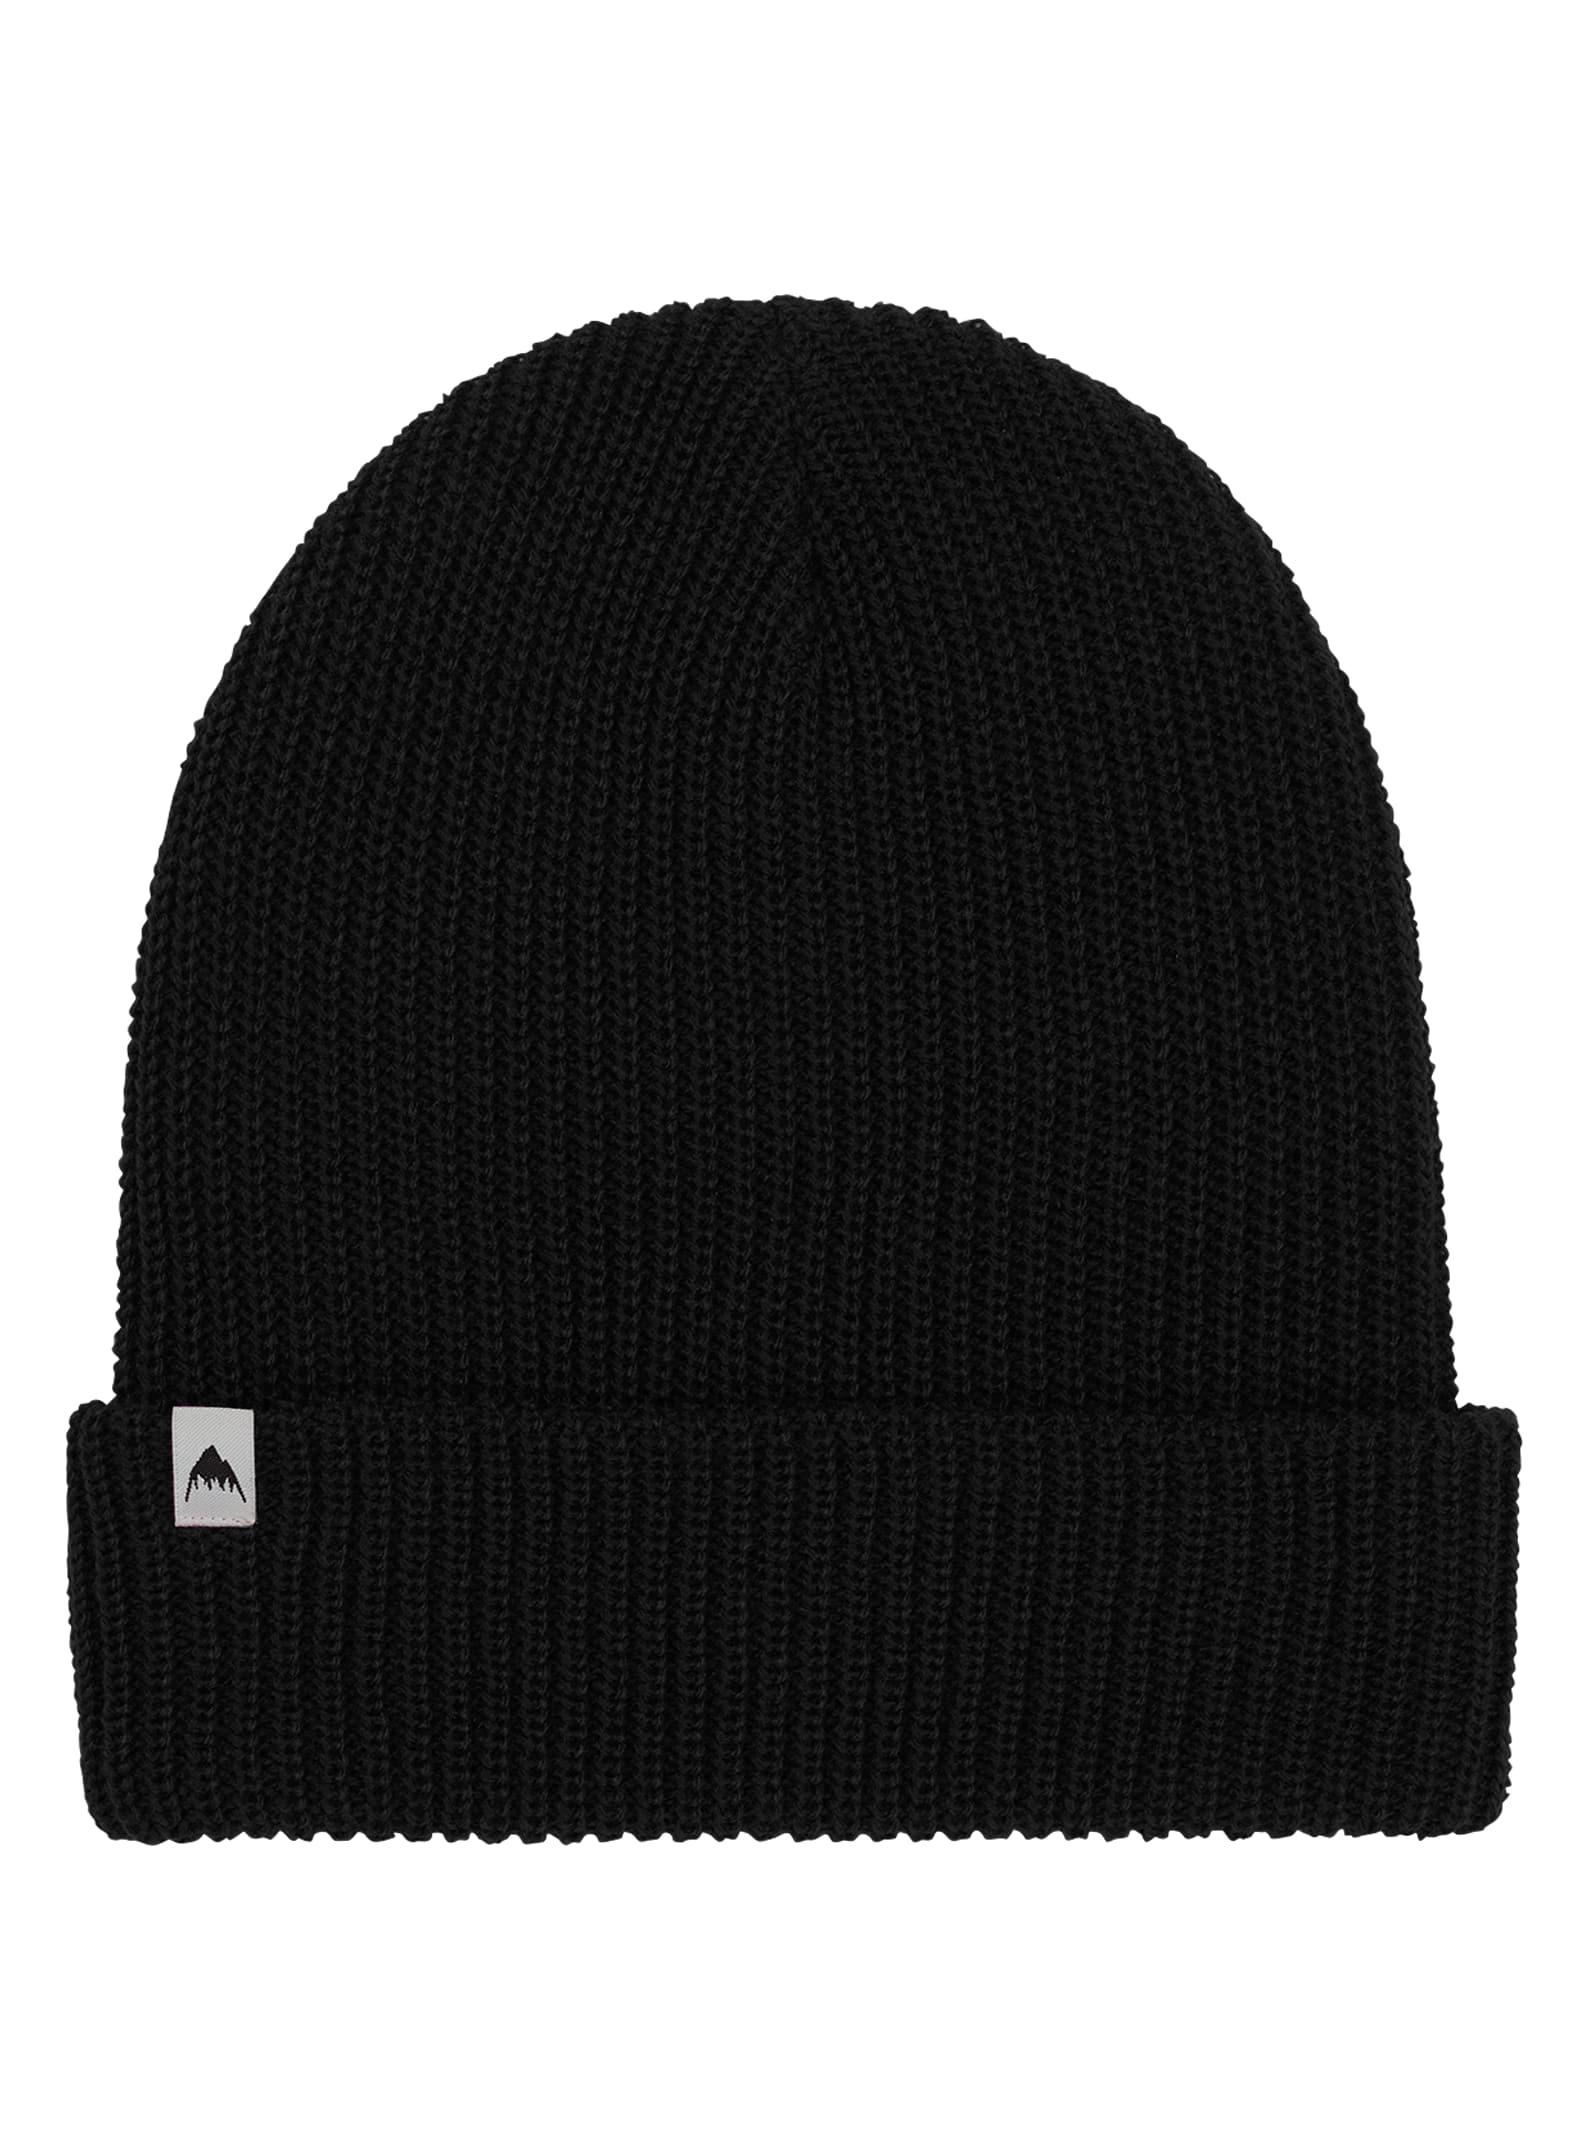 9d63b359da7807 Men's Hats & Beanies | Burton Snowboards